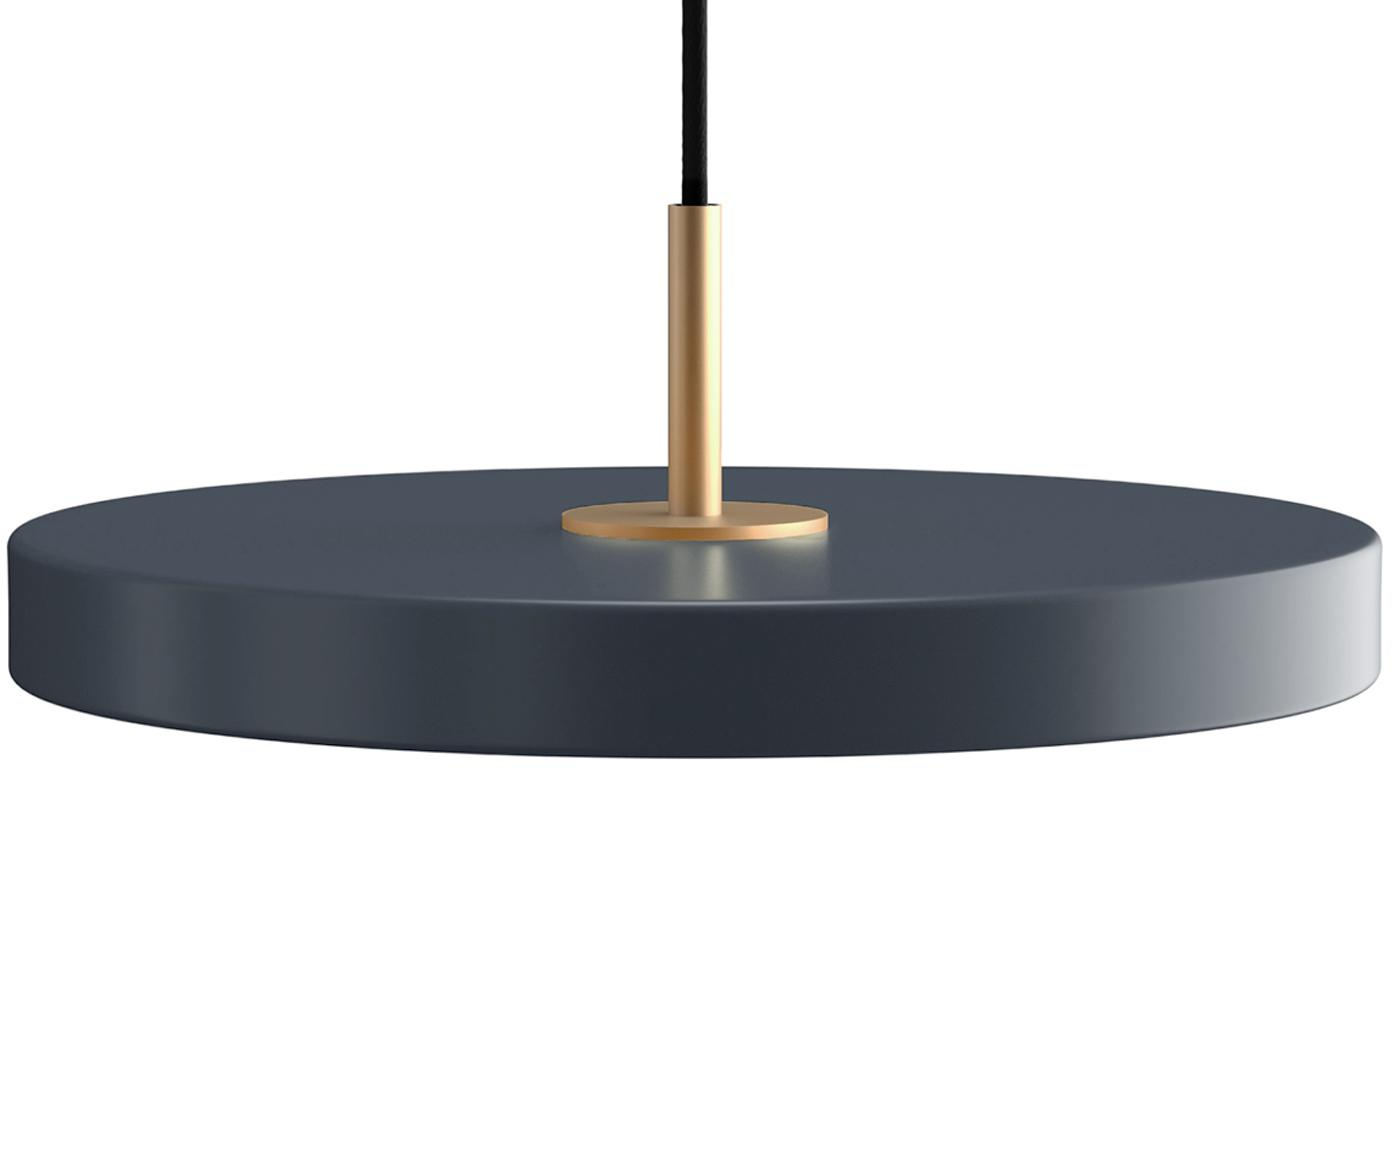 Design LED hanglamp Asteria, Lampenkap: gelakt aluminium, Antraciet, Ø 31 x H 14 cm